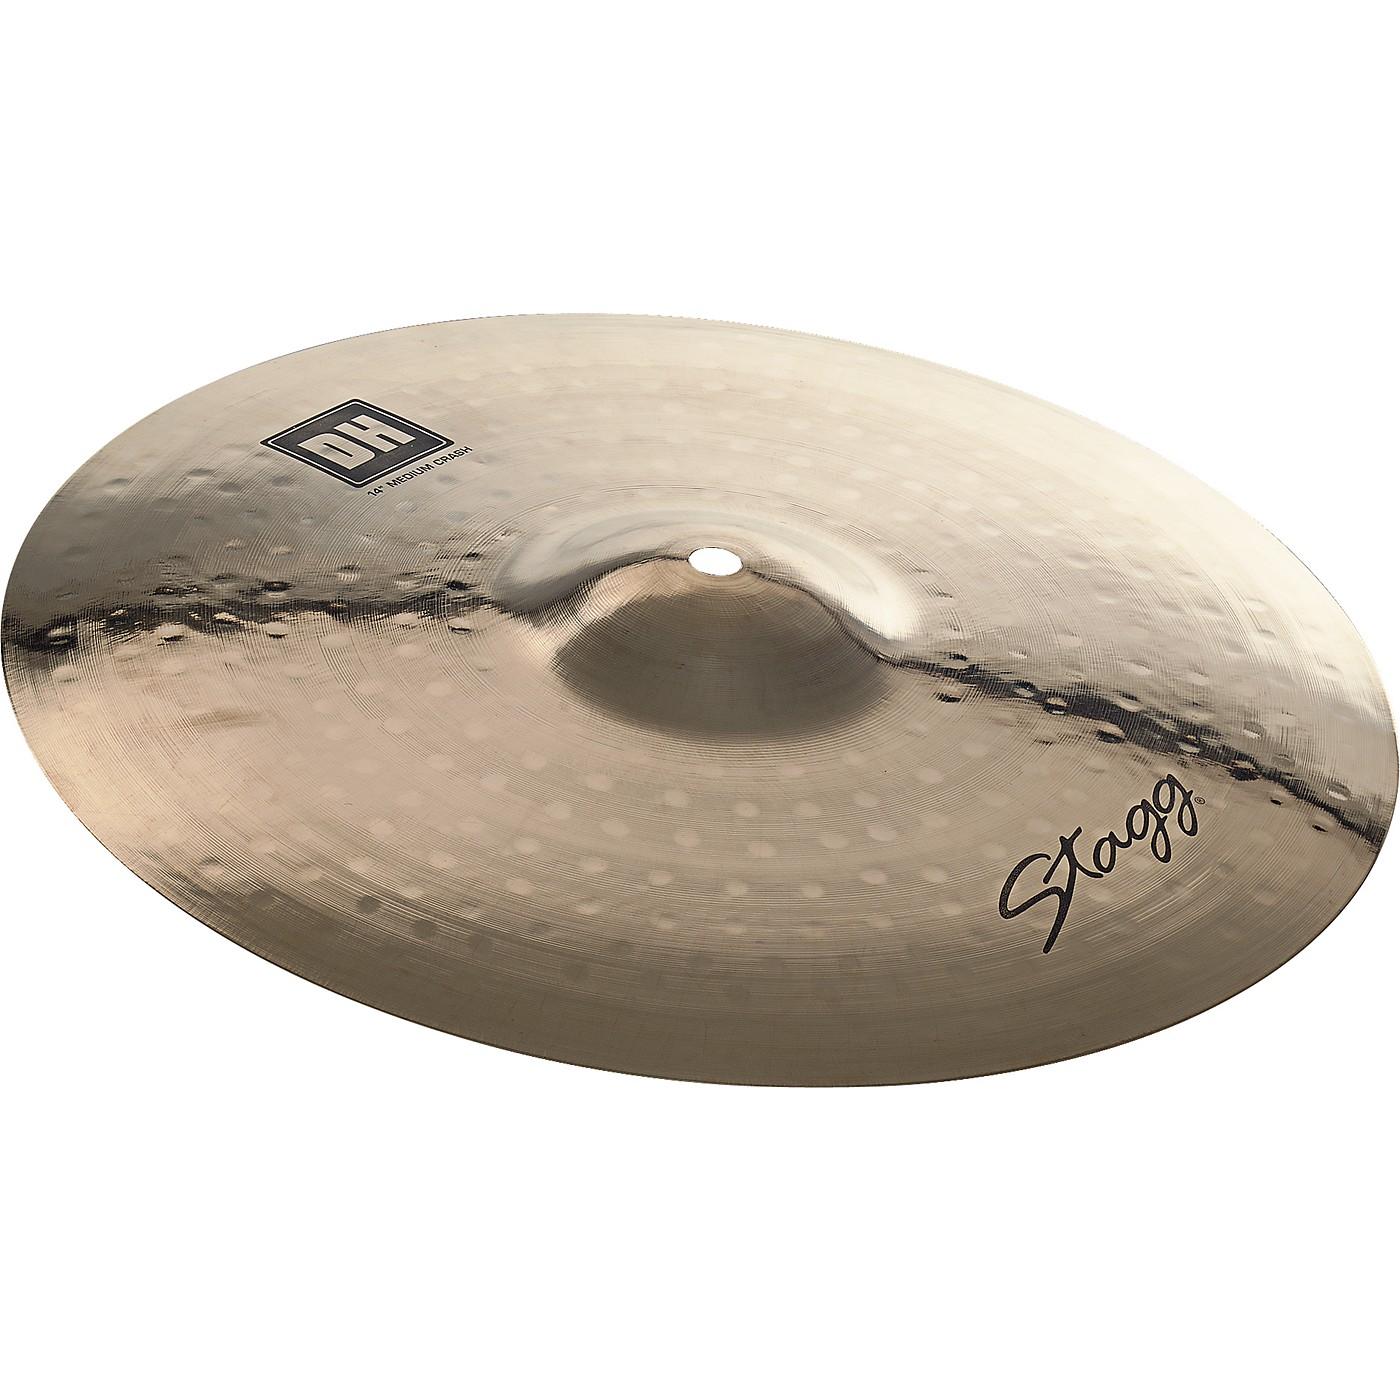 Stagg DH Dual-Hammered Brilliant Medium Crash Cymbal thumbnail